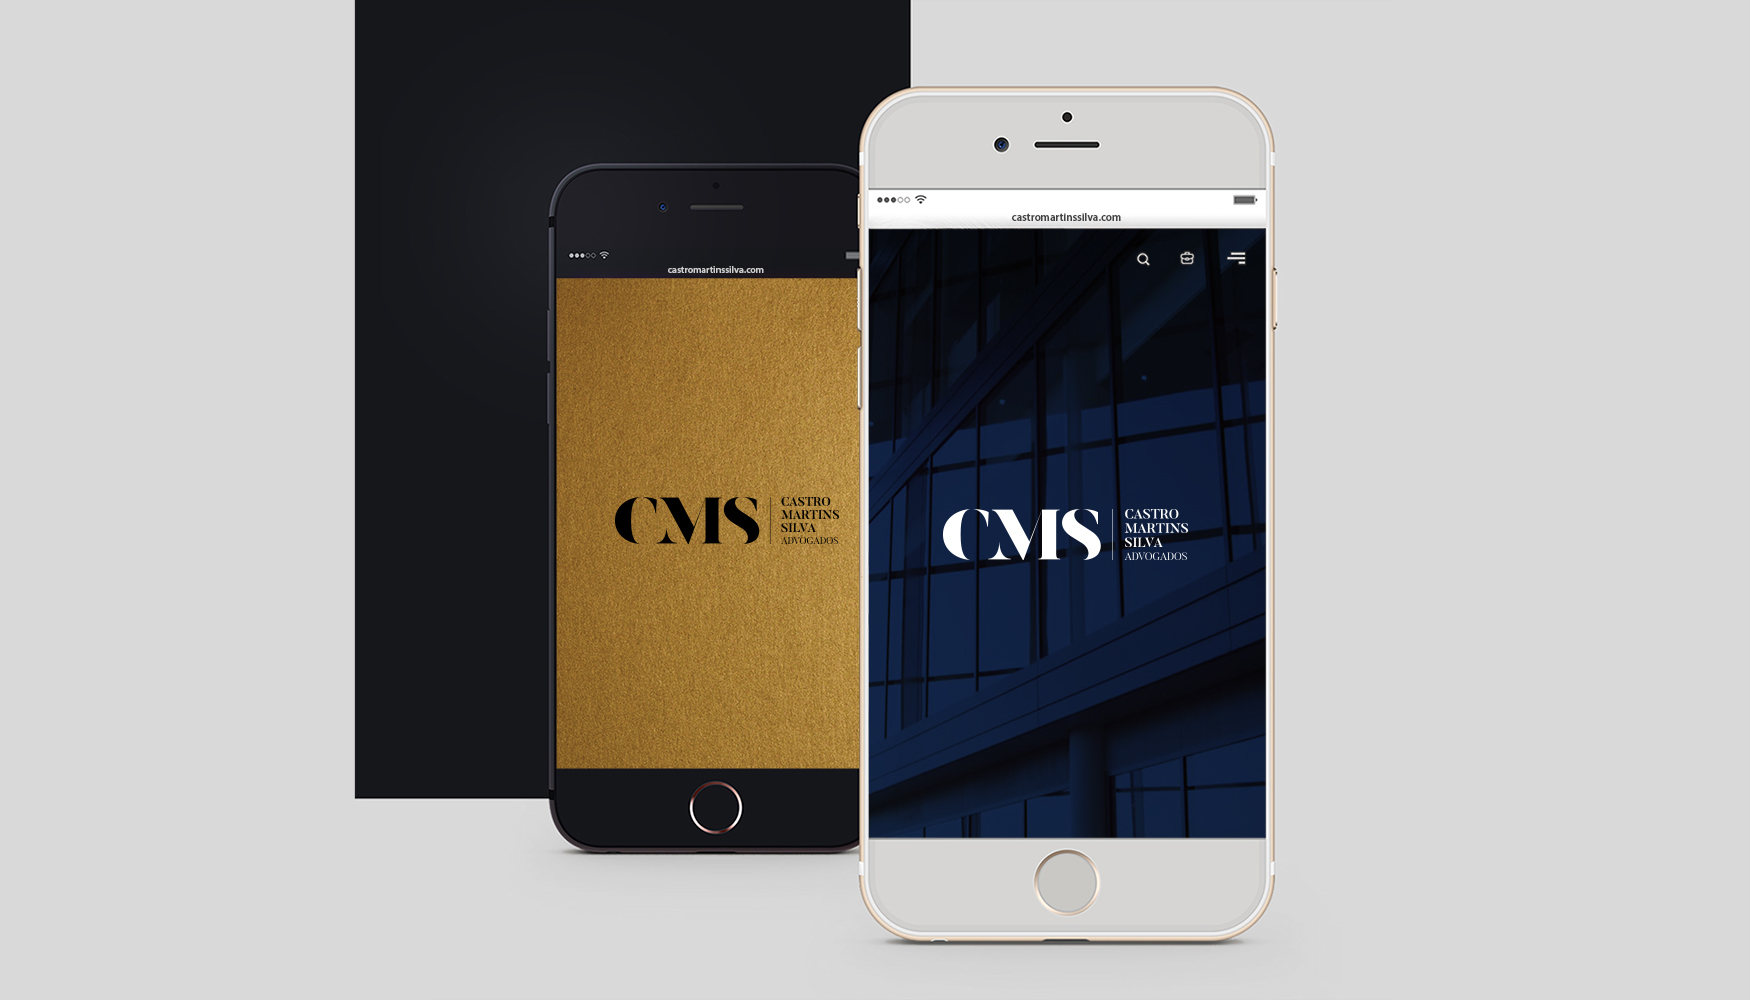 cms_mobile